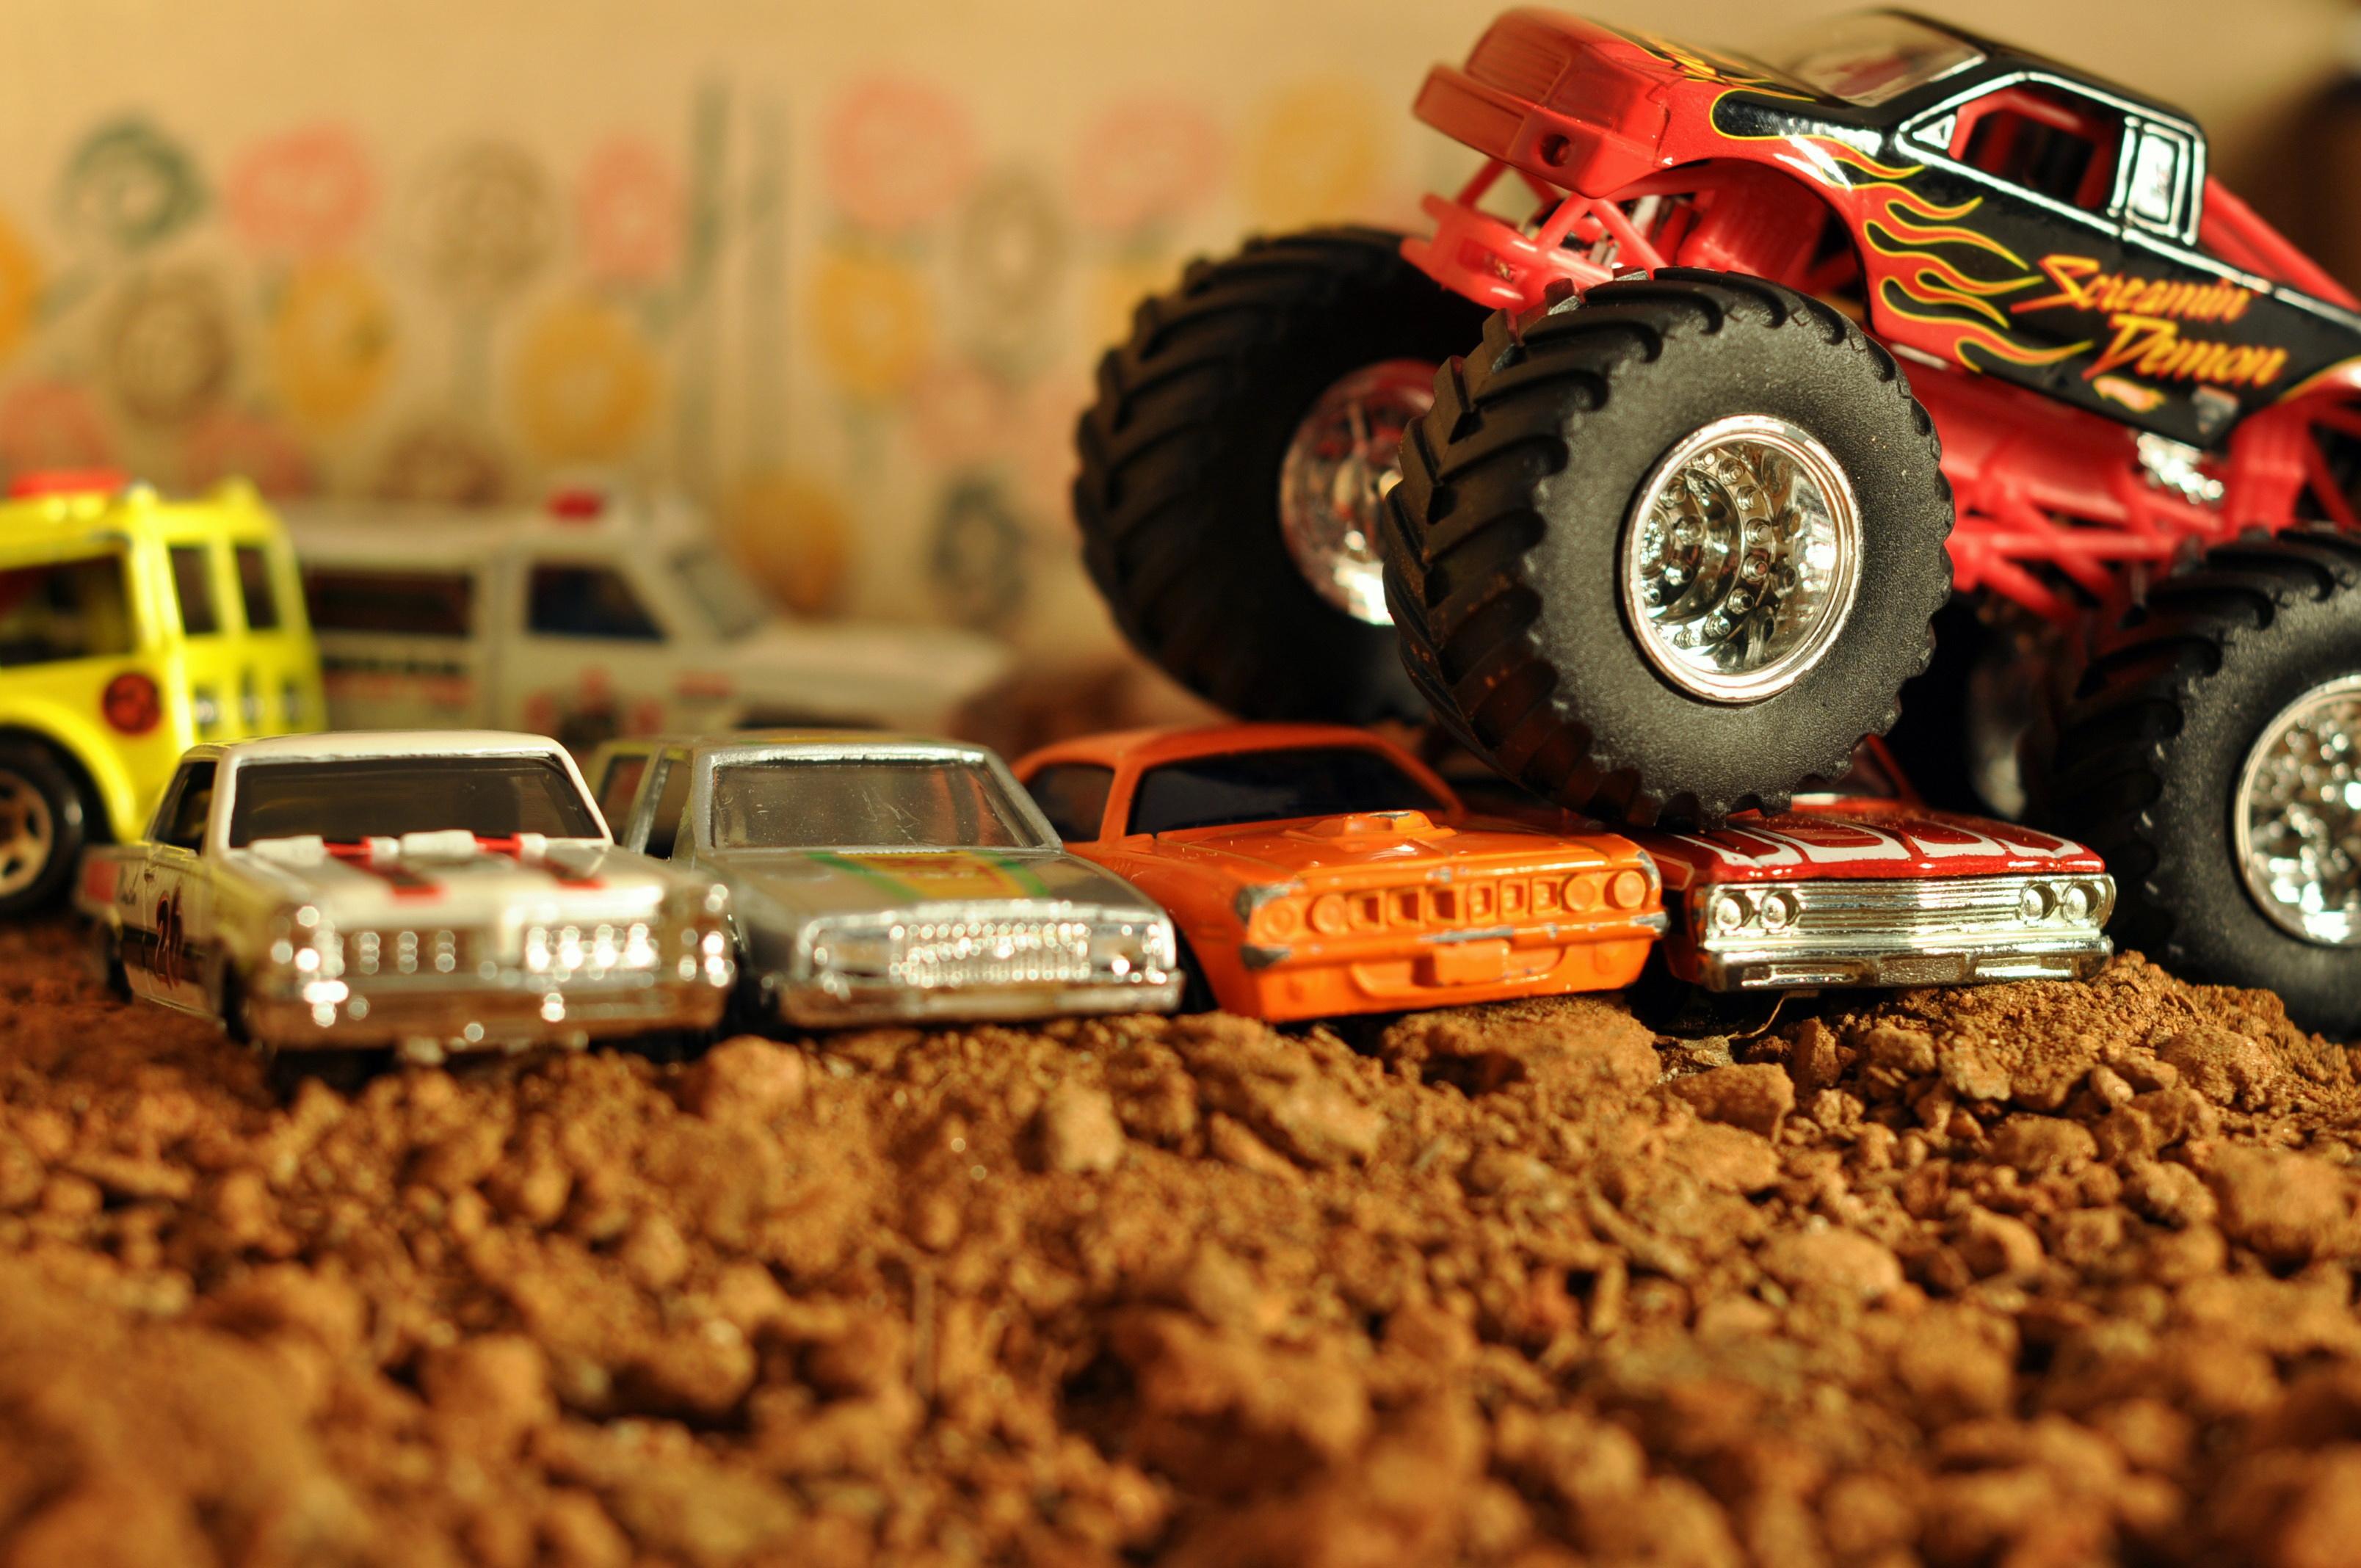 Top Wallpaper Logo Hot Wheel - toys-monster-trucks-car-vehicle-Toy-scale-model-racing-Hot-Wheels-Matchbox-motorsport-model-car-auto-racing-dirt-track-racing-off-roading-off-road-racing-monster-truck-260056  Graphic_488548.jpg